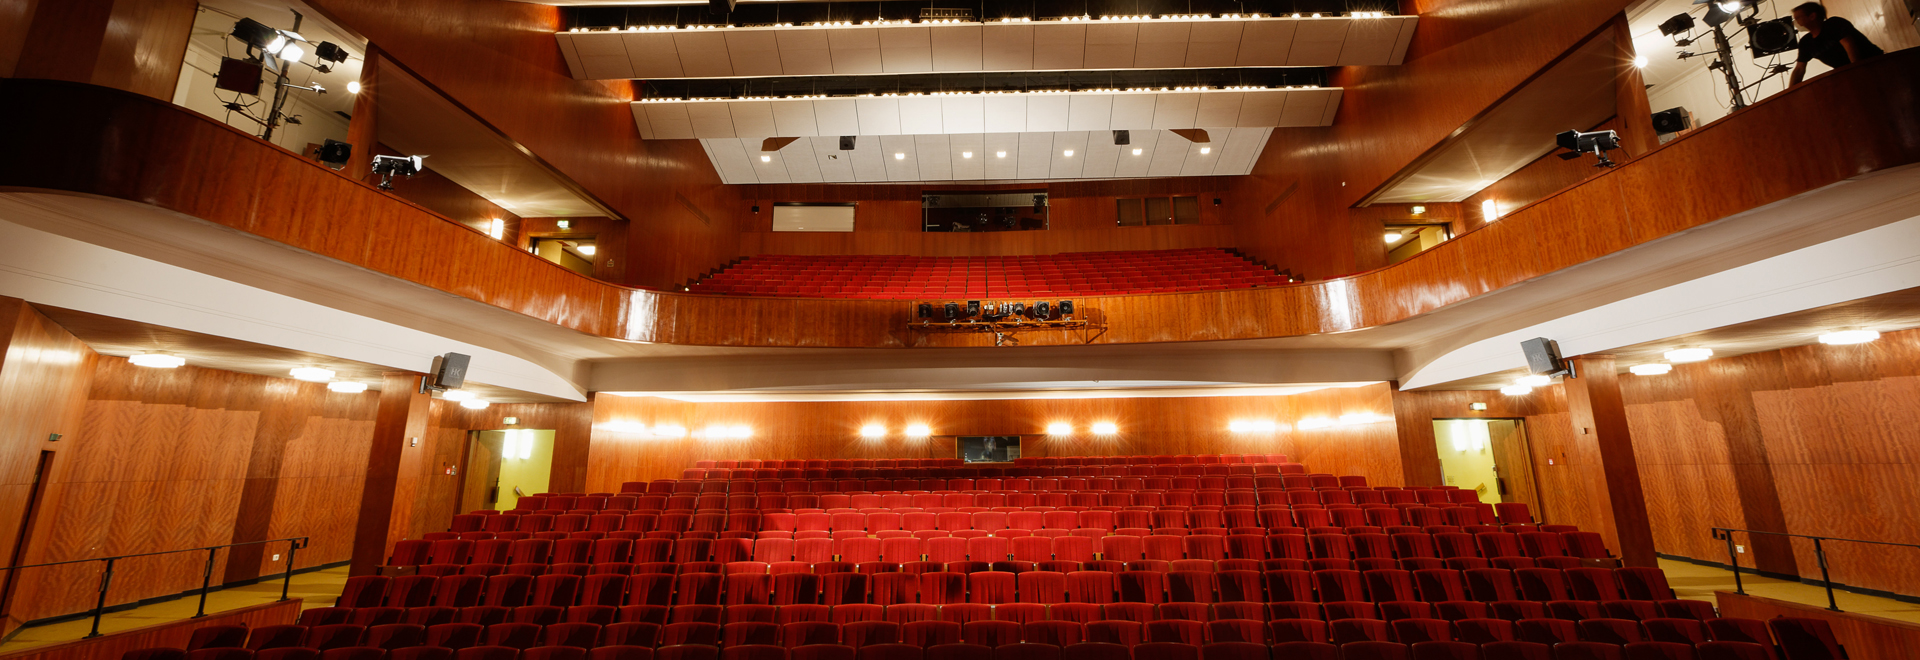 Kulturhaus Gotha Saal ©Bernd Seydel